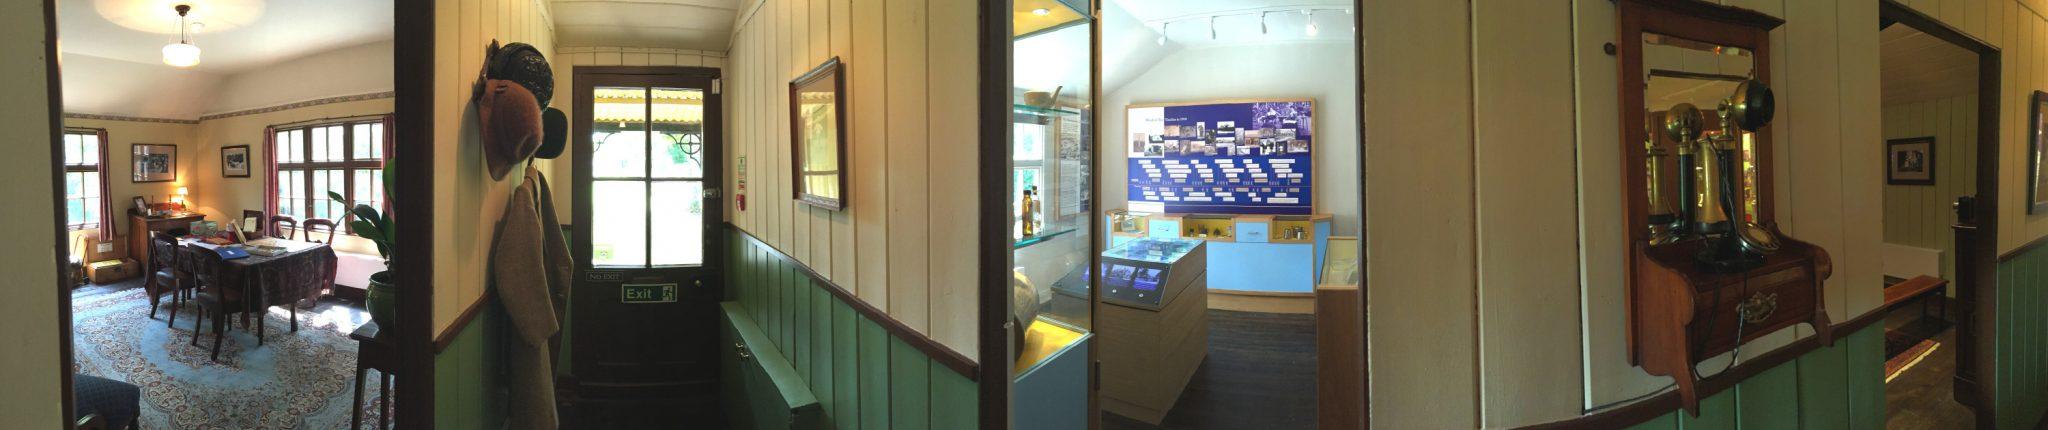 panorama-explore-museum-hallway